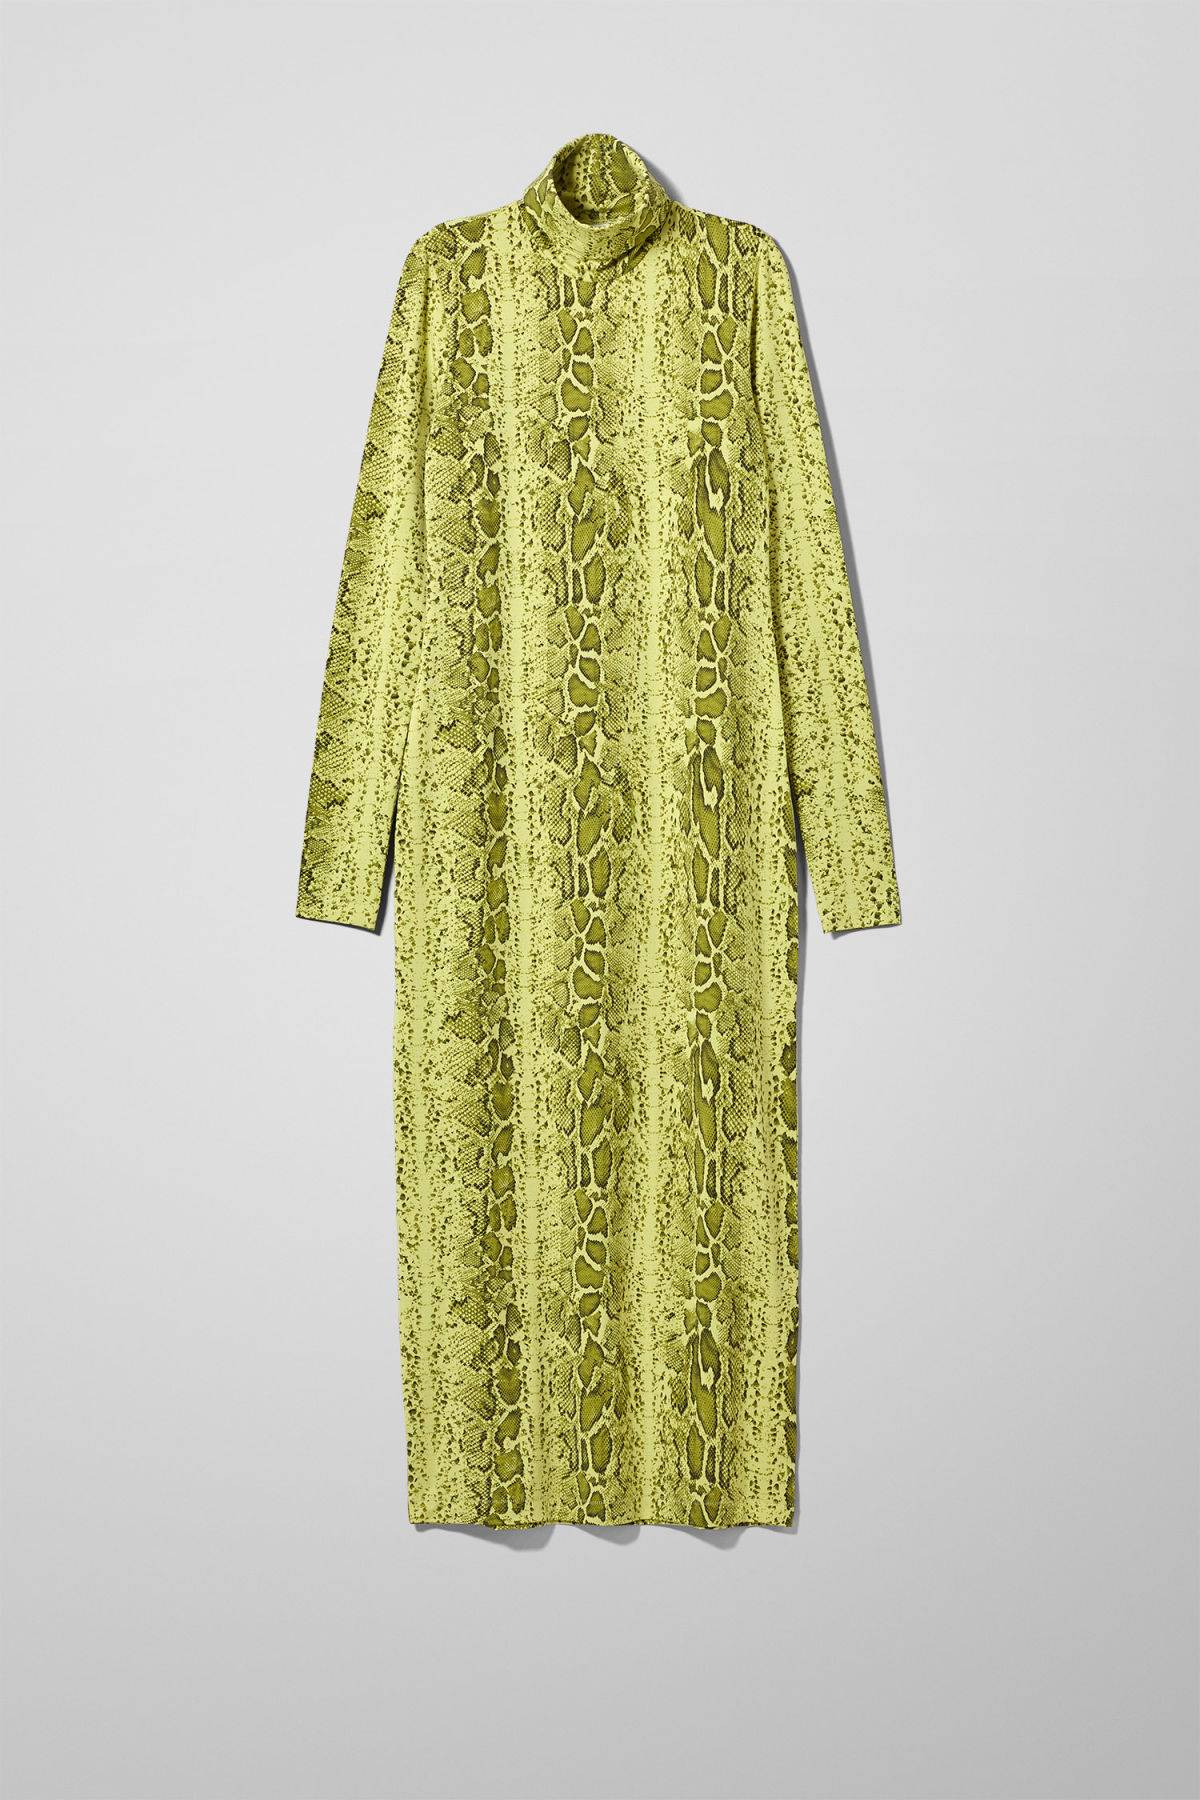 Image of Maxine Dress - Yellow-M